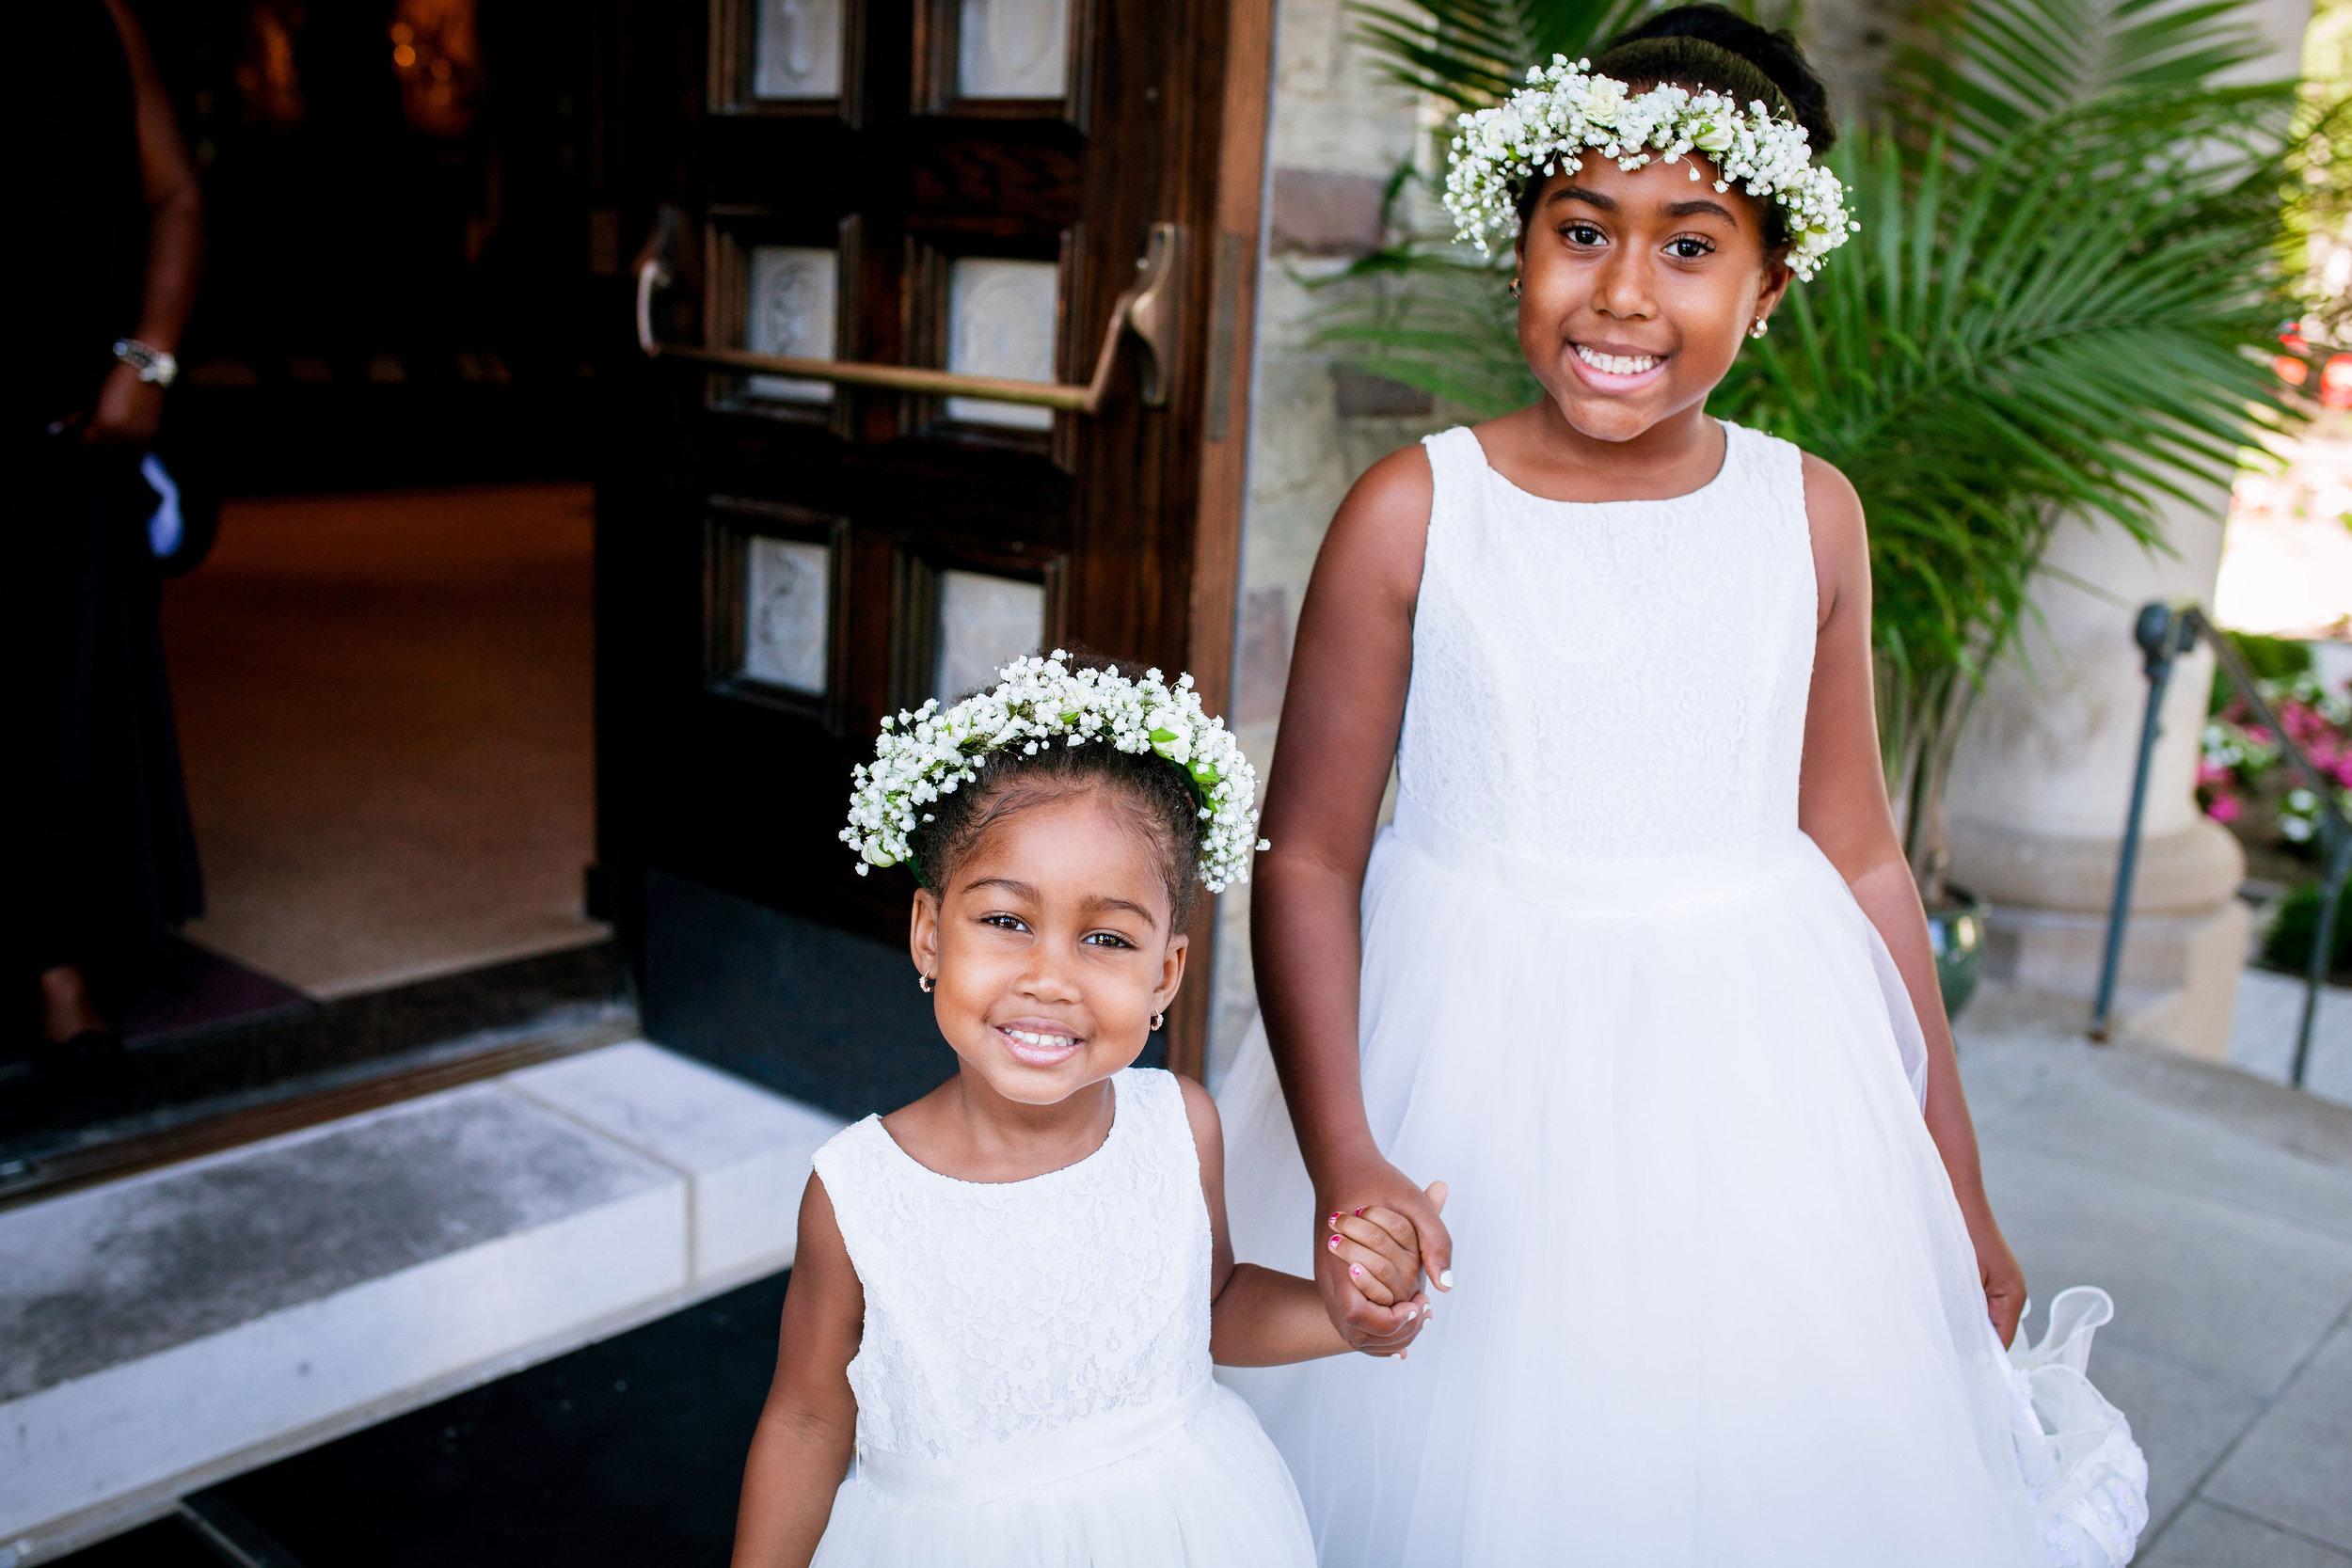 Karimah_Gheddai_Photography_Catholic_Wedding_Alexander_Muir_Gardens_Paradise_Banquet_Hall_7